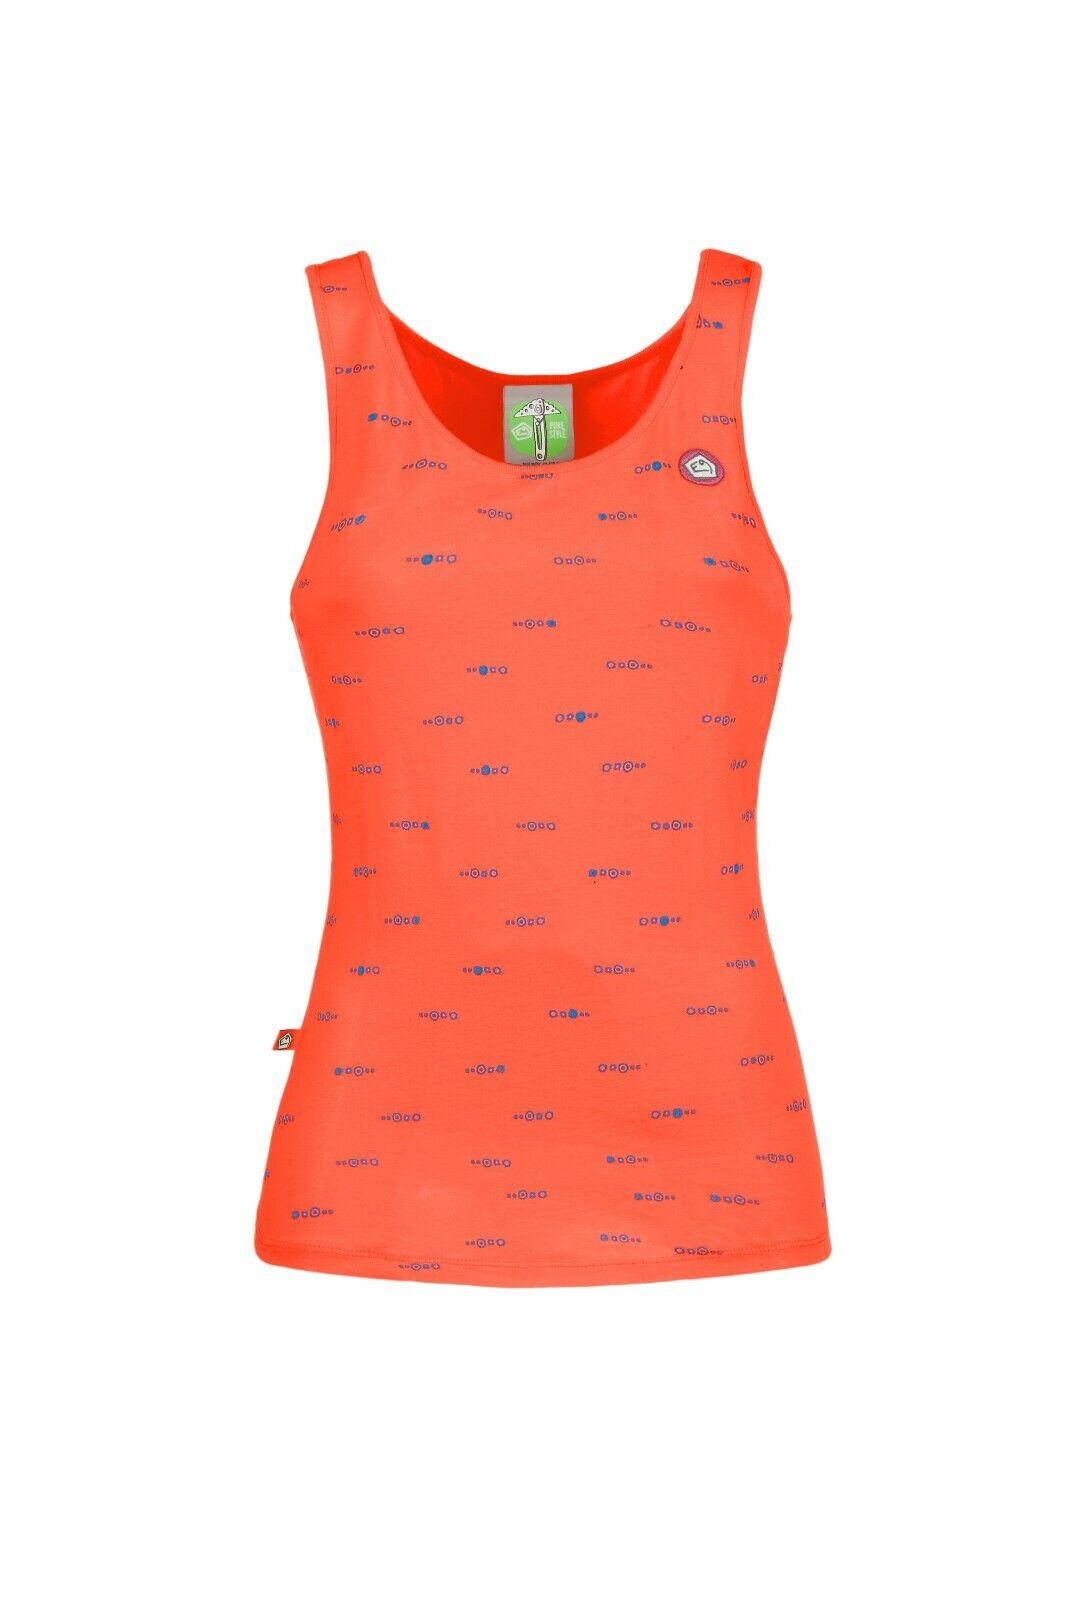 E9 Ariel Ligero Camiseta con Tirantes para Camiseta Musculosa  de Mujer Rojo  perfecto